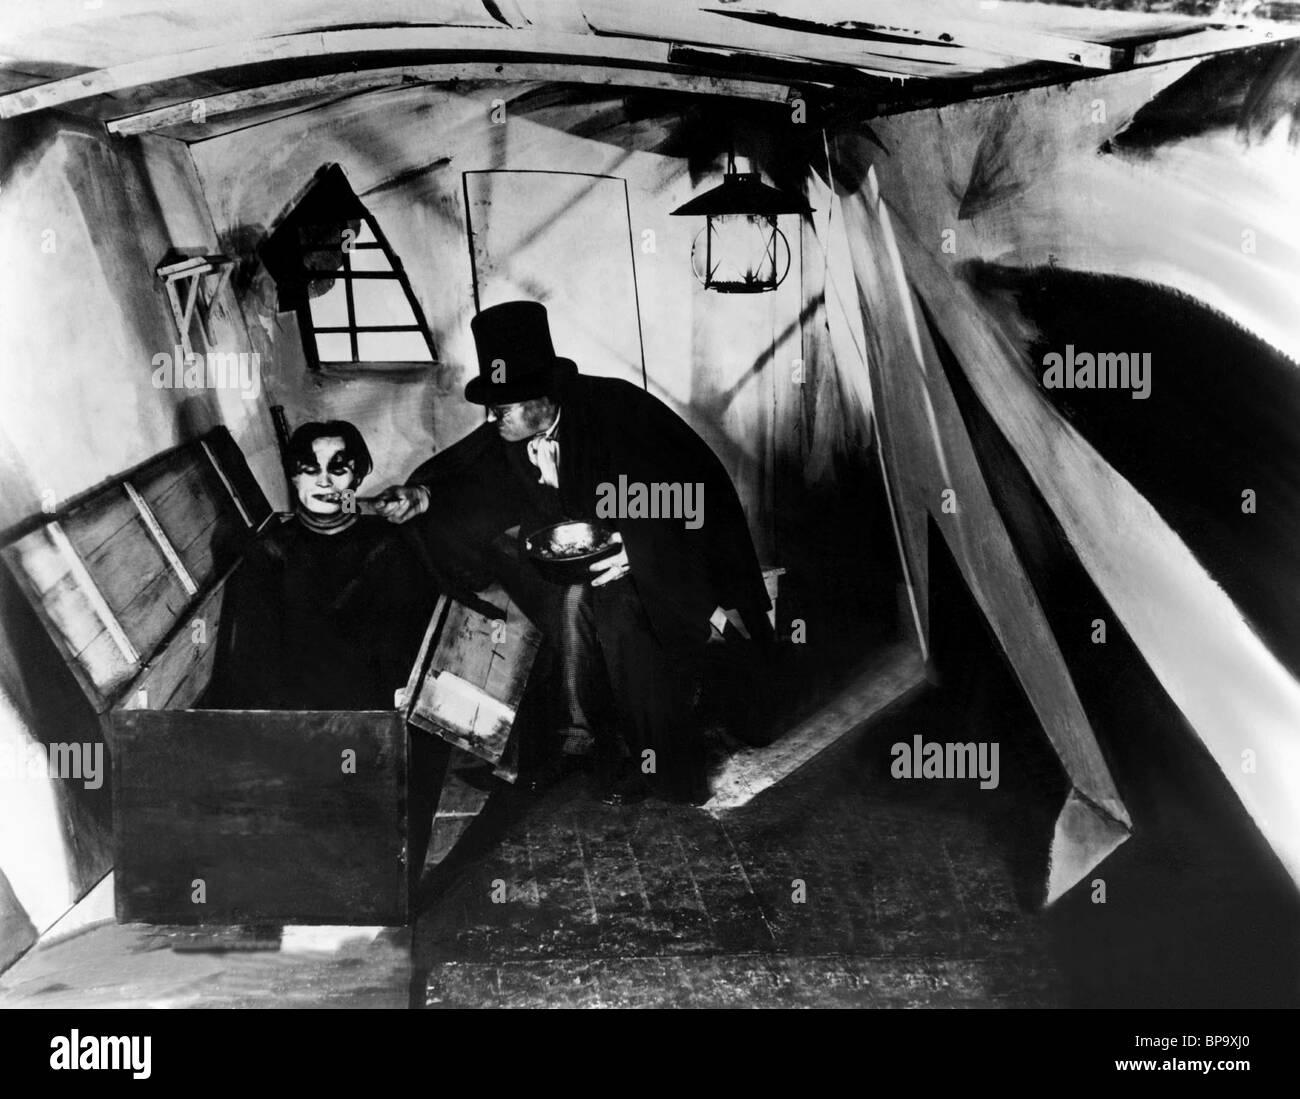 CONRAD VEIDT THE CABINET OF DR. CALIGARI (1919) - Stock Image